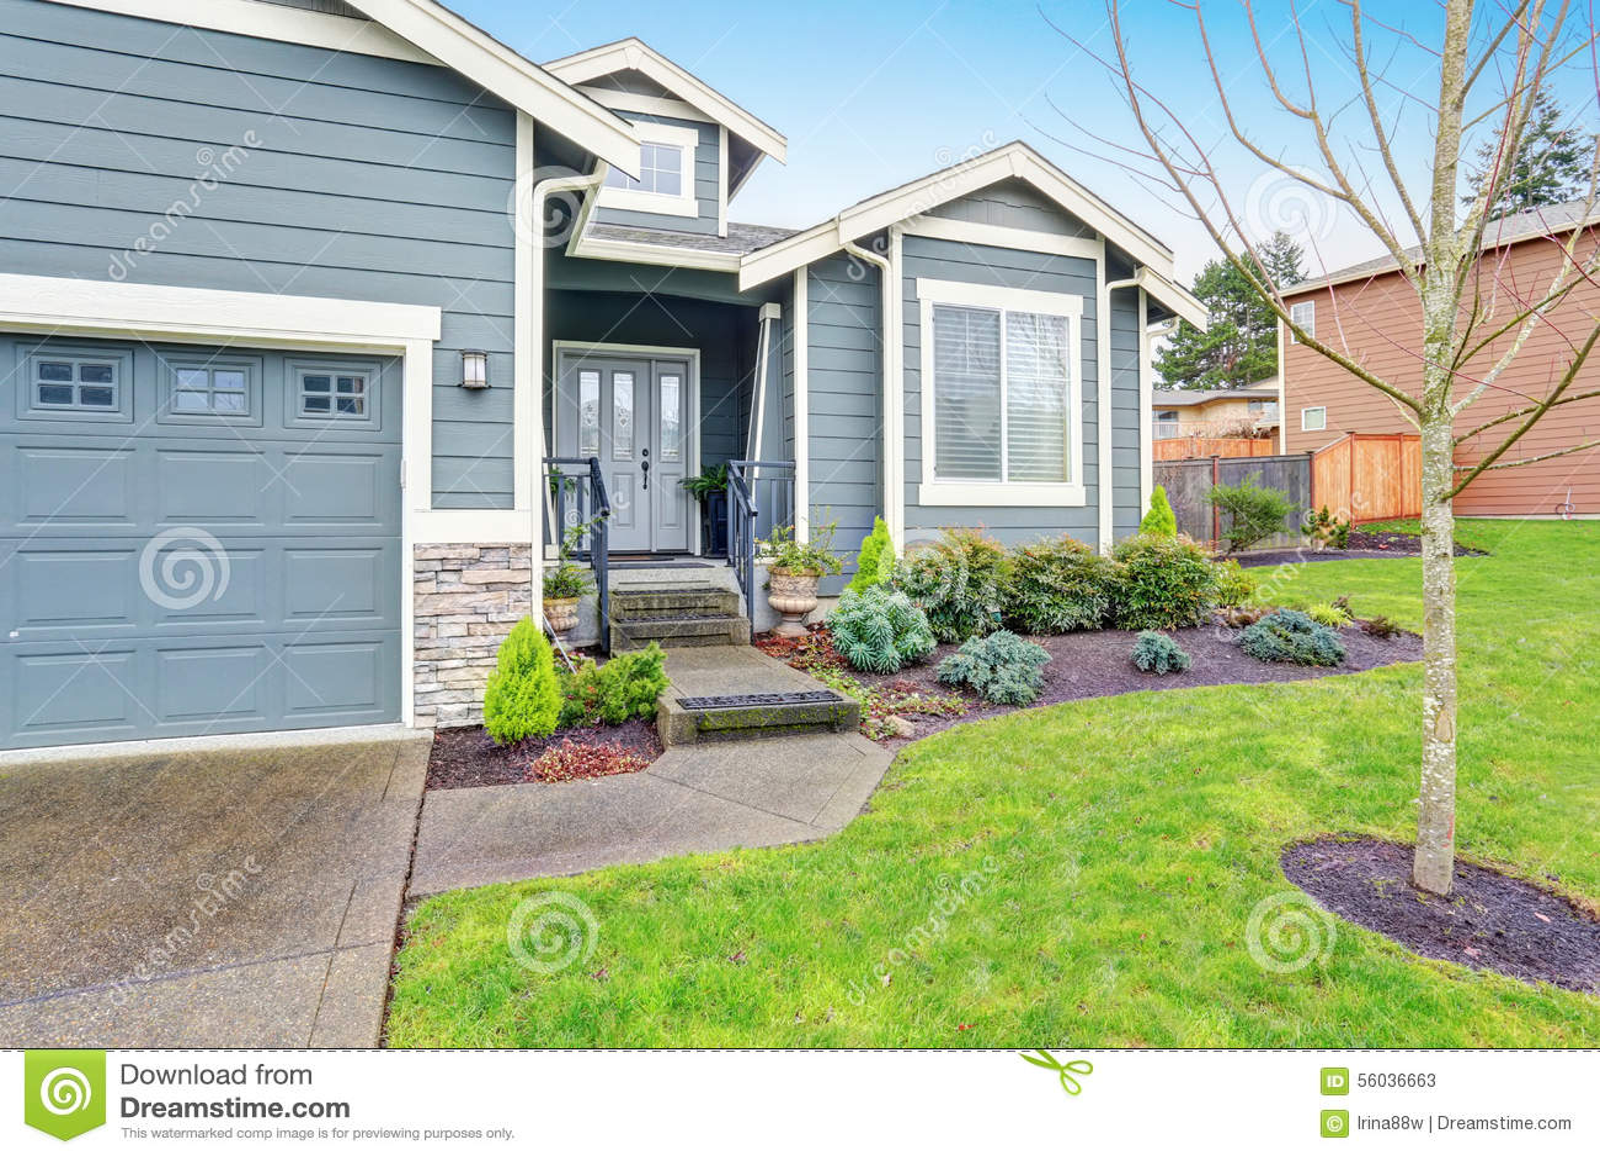 Mooi modern huis met gras en oprijlaan stock foto afbeelding 56036663 - Mooi huis ...